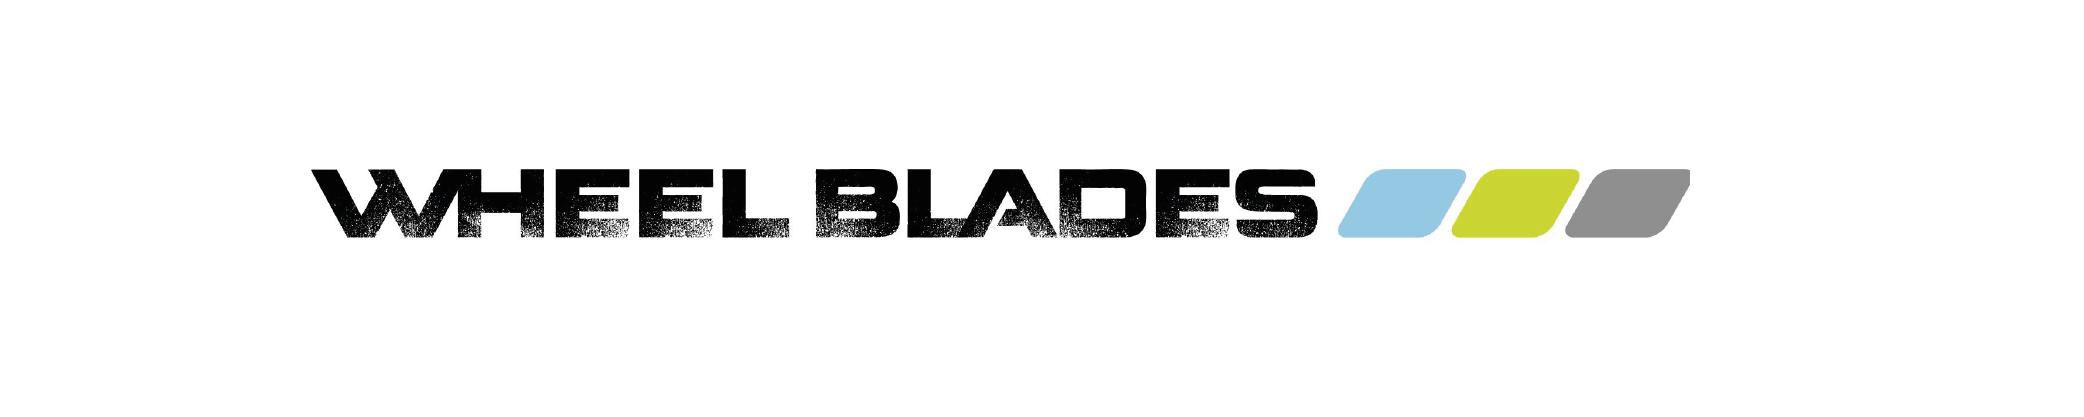 Wheelblades